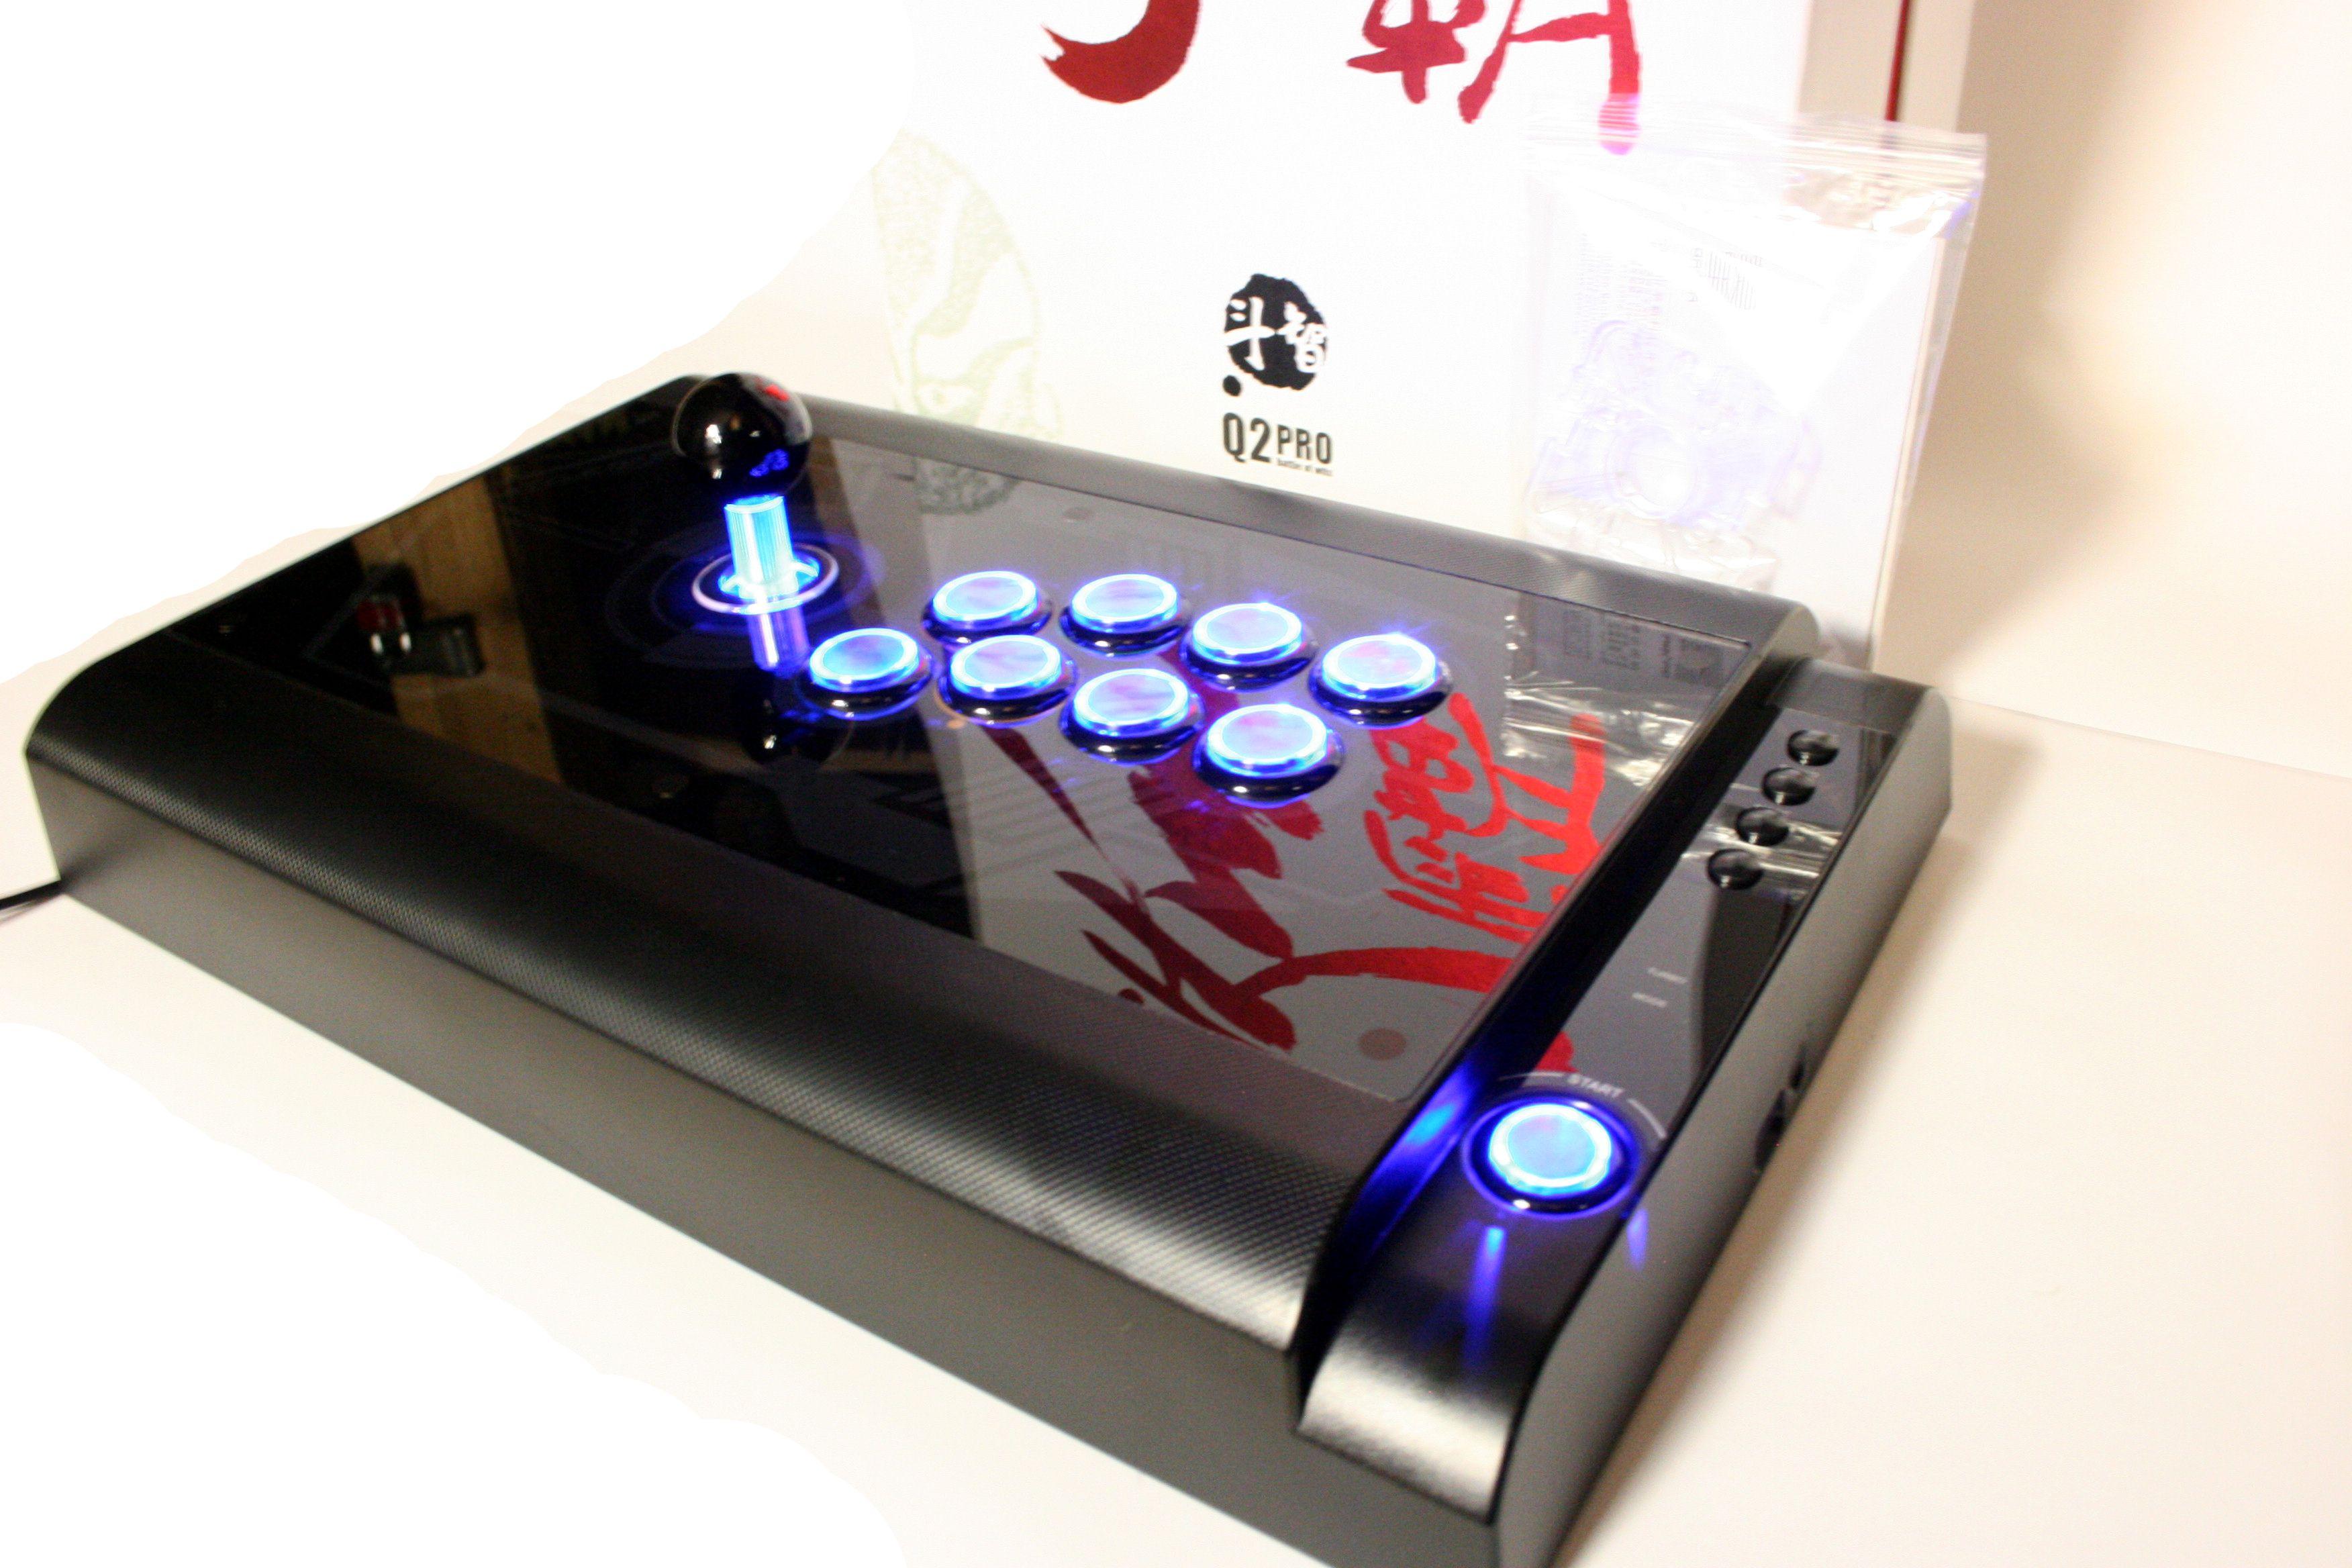 Qanba Q2 Pro Led Black Light Up Arcade Stick From Videogamesnewyork Com Arcade Joystick Arcade Arcade Stick